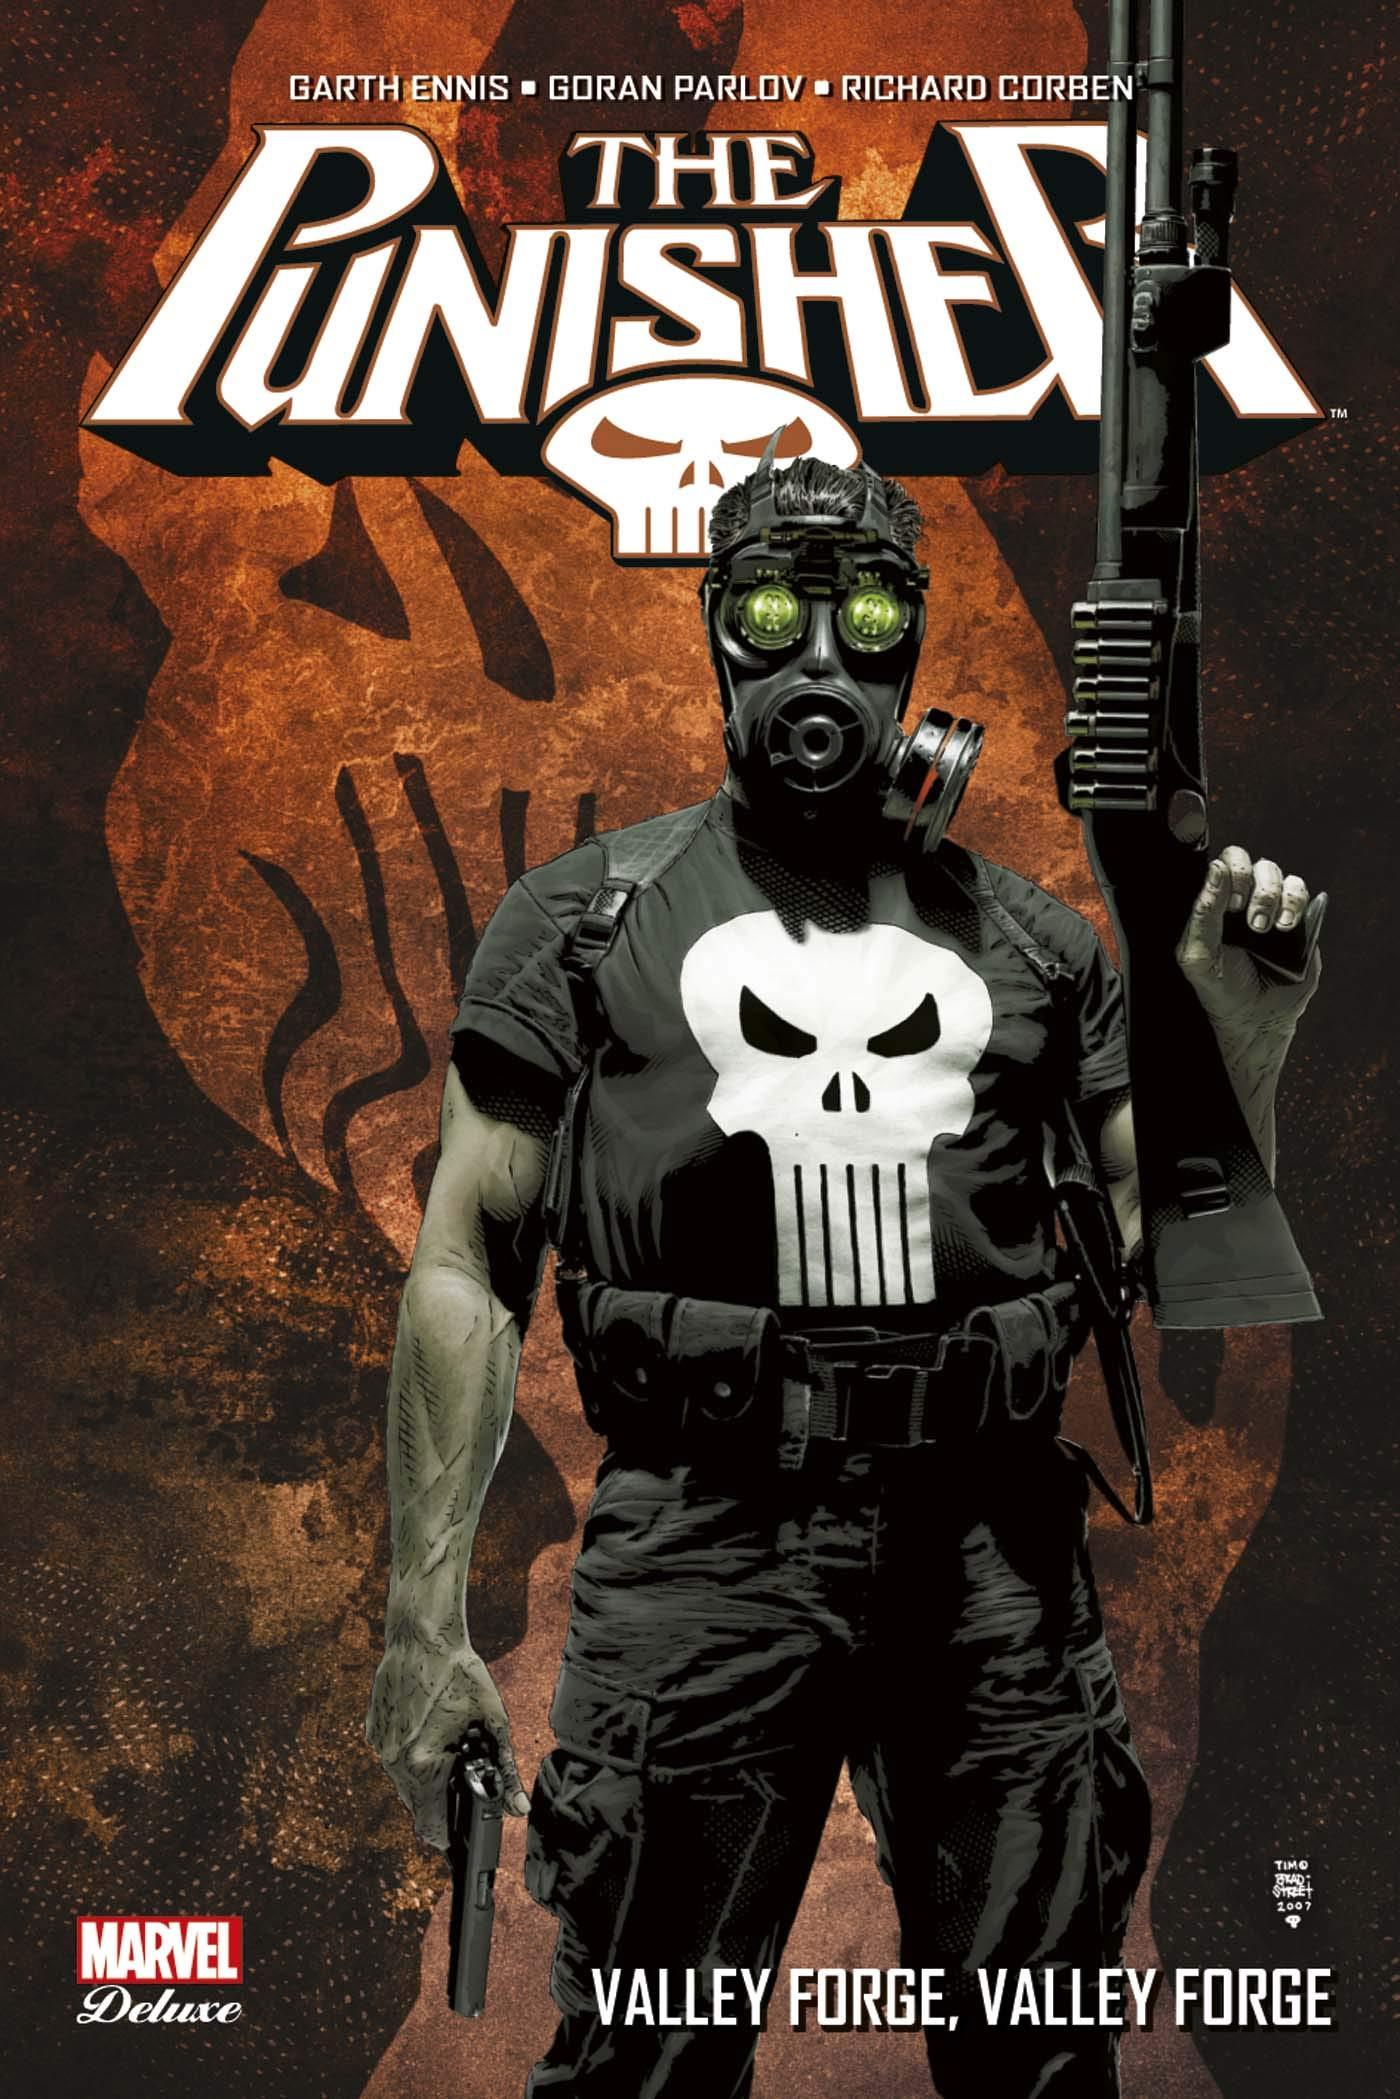 Punisher Deluxe : valley forge, valley forge Album – 10 octobre 2018 Garth Ennis Goran Parlov Richard Corben Panini